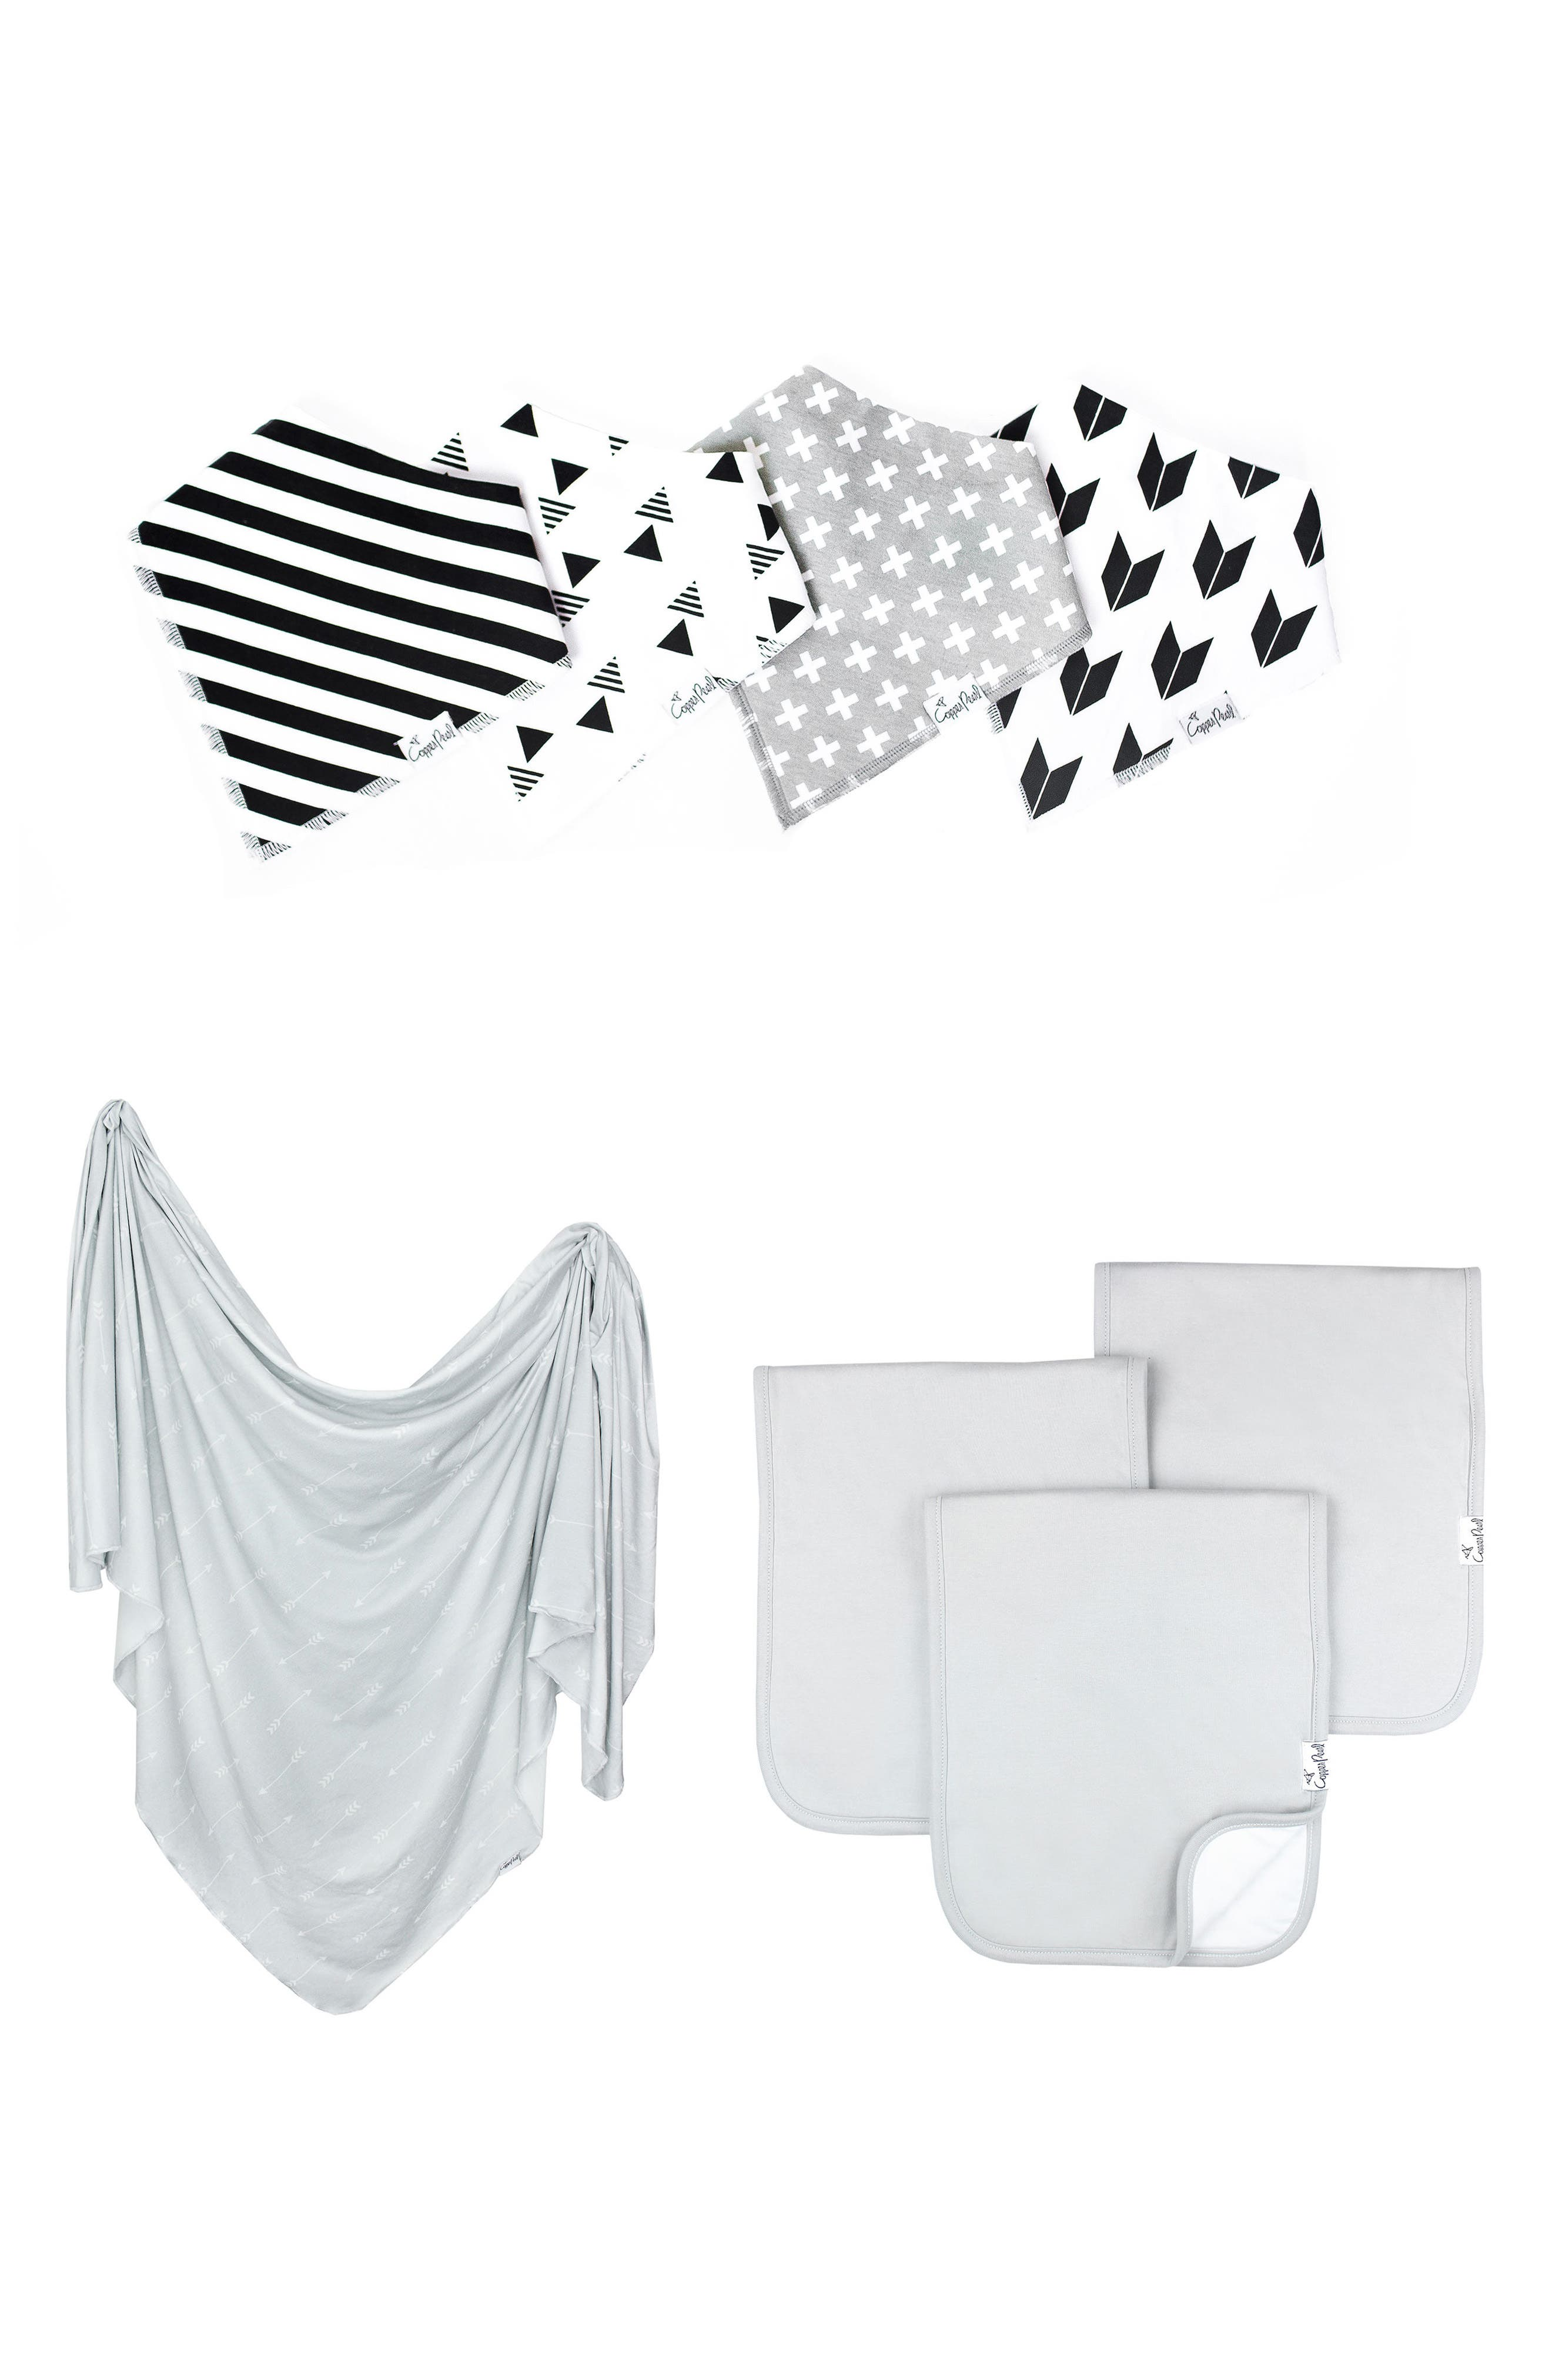 Shade Bib, Burp Cloth & Swaddle Blanket Gift Set,                         Main,                         color, SHADE